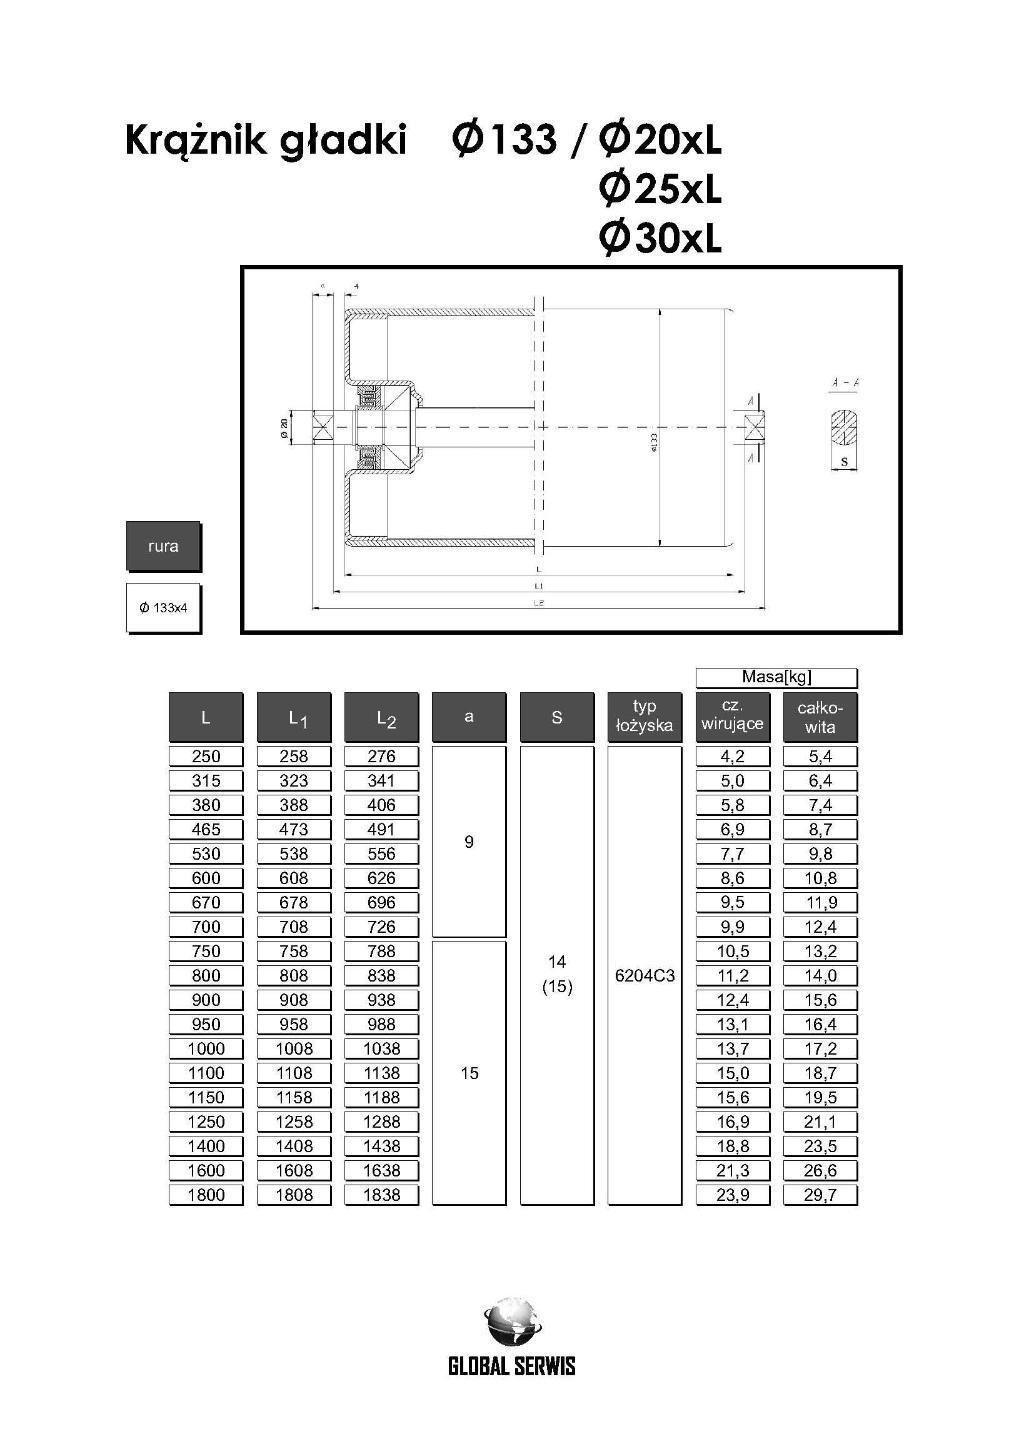 Krążnik Gładki 133 20xL